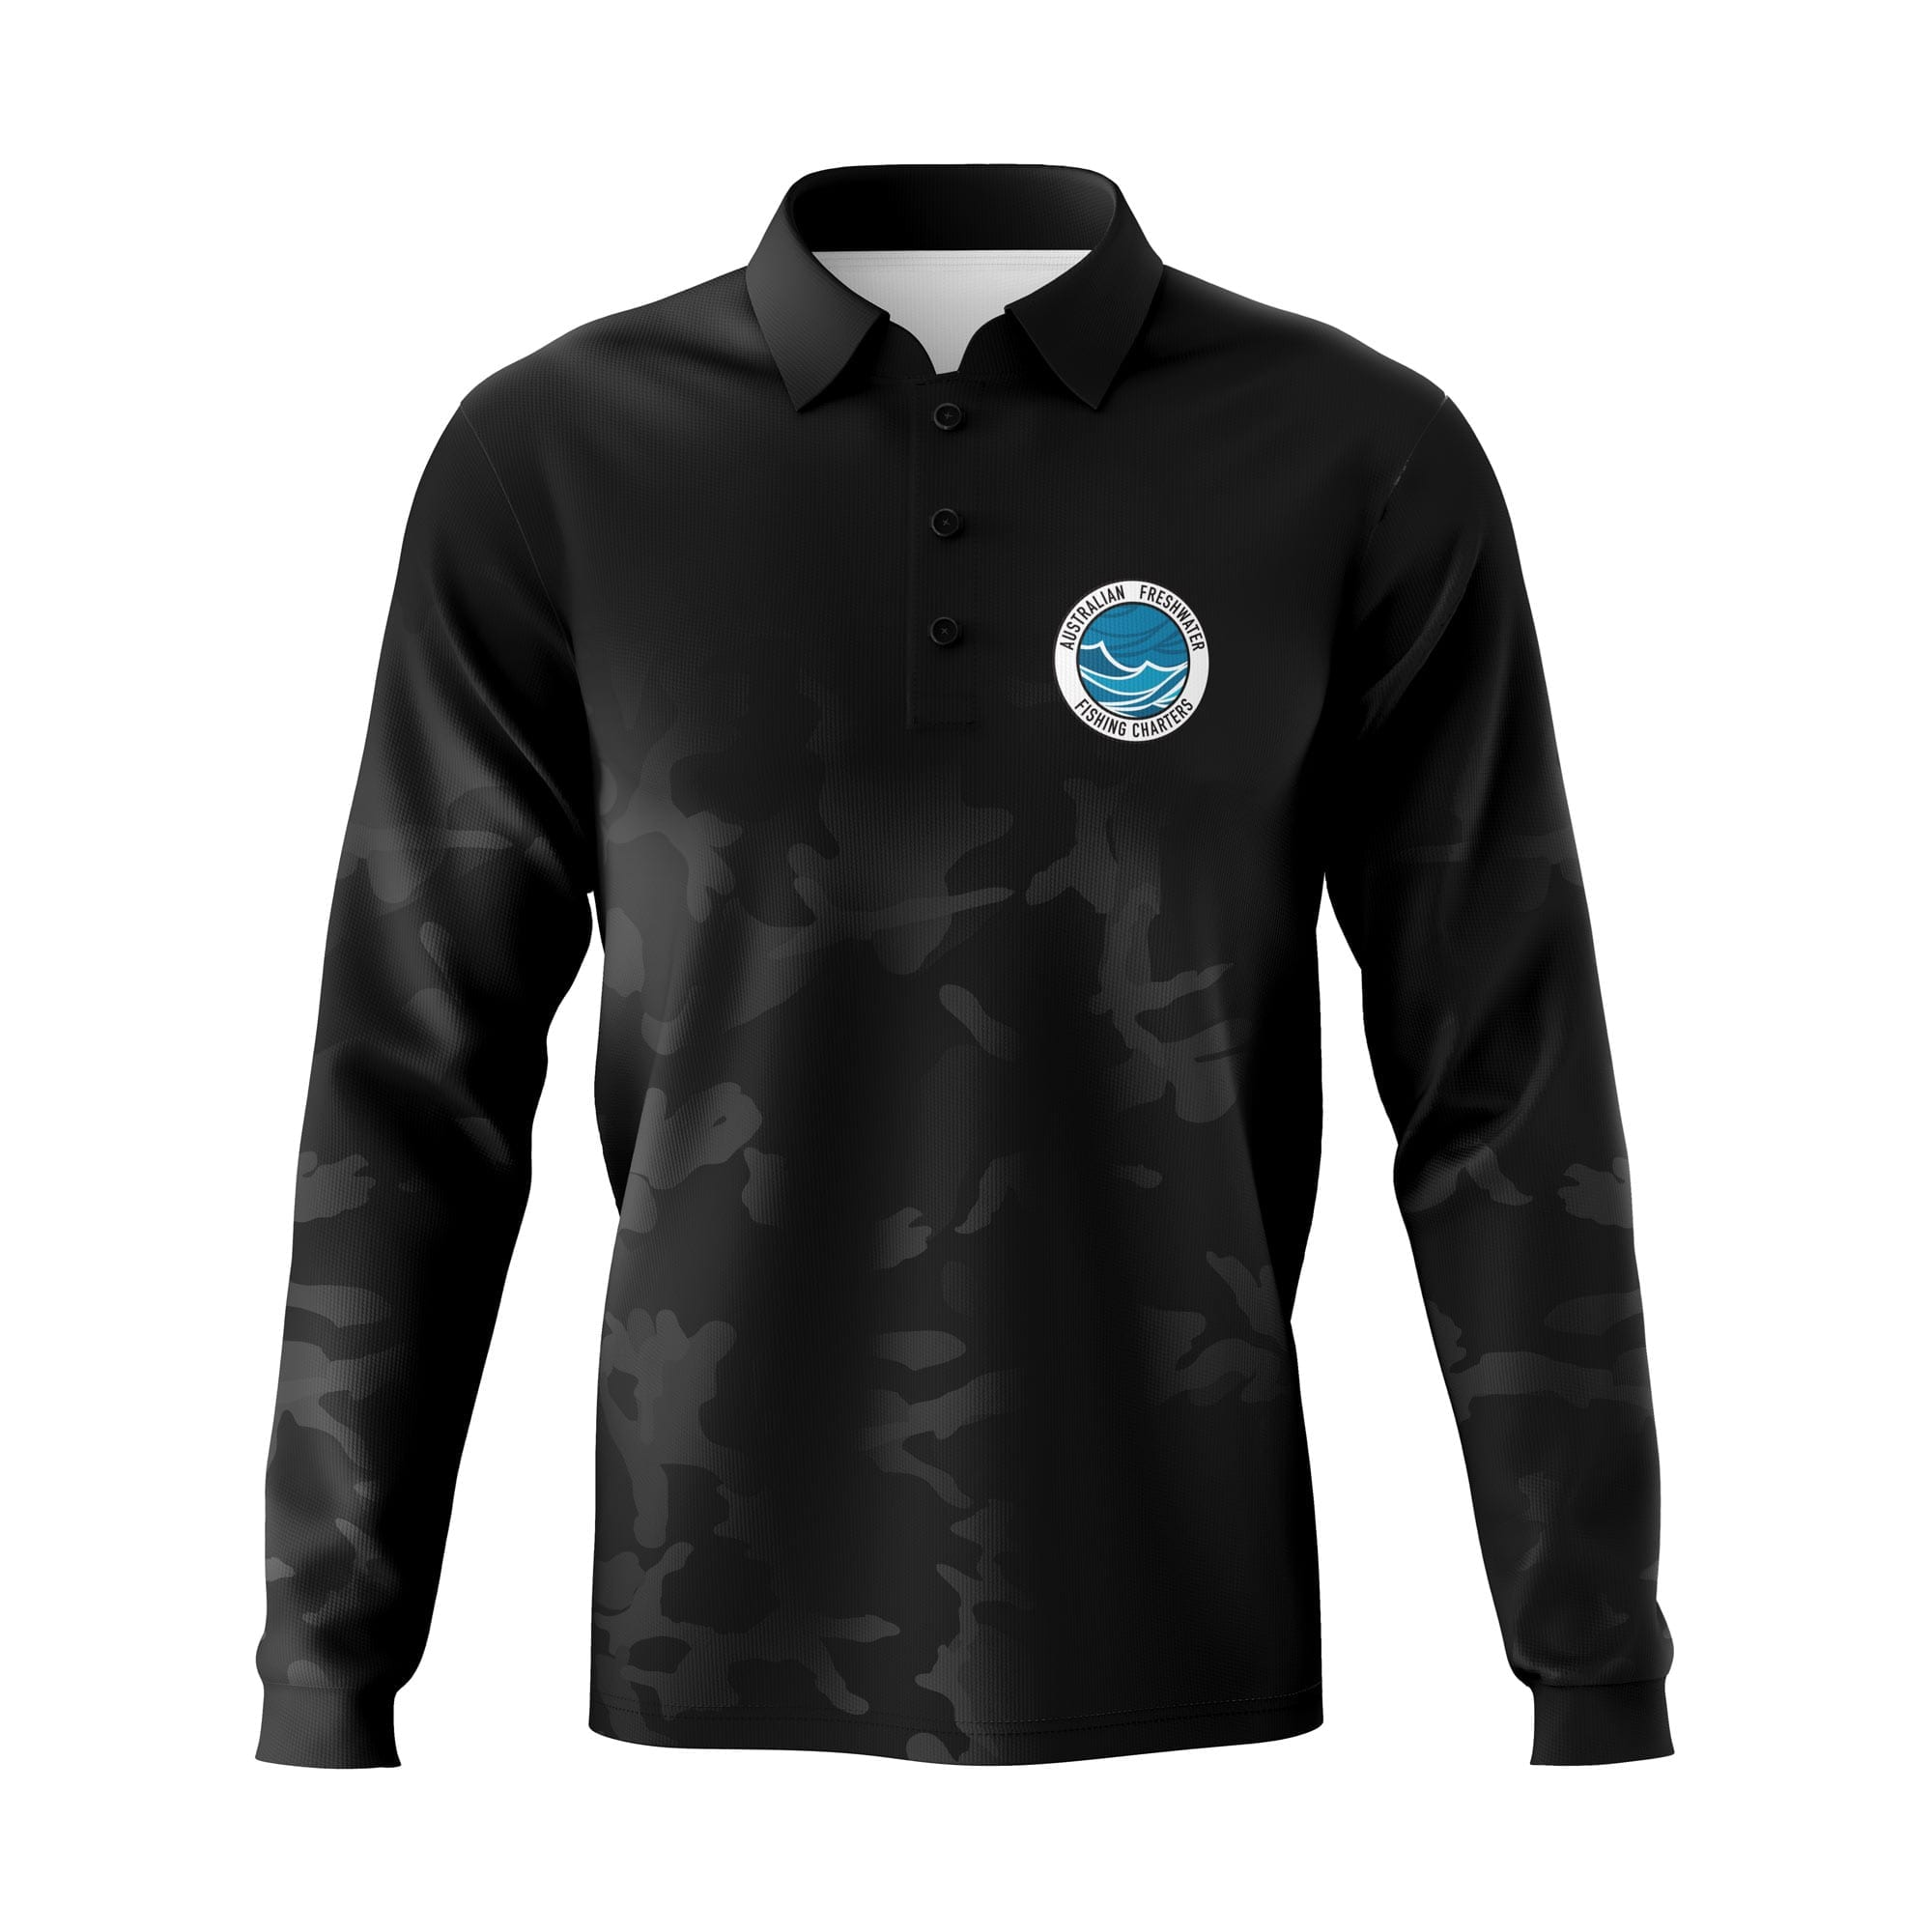 AFFC-Fishing-Shirt-Front-Dark-Camo-ML